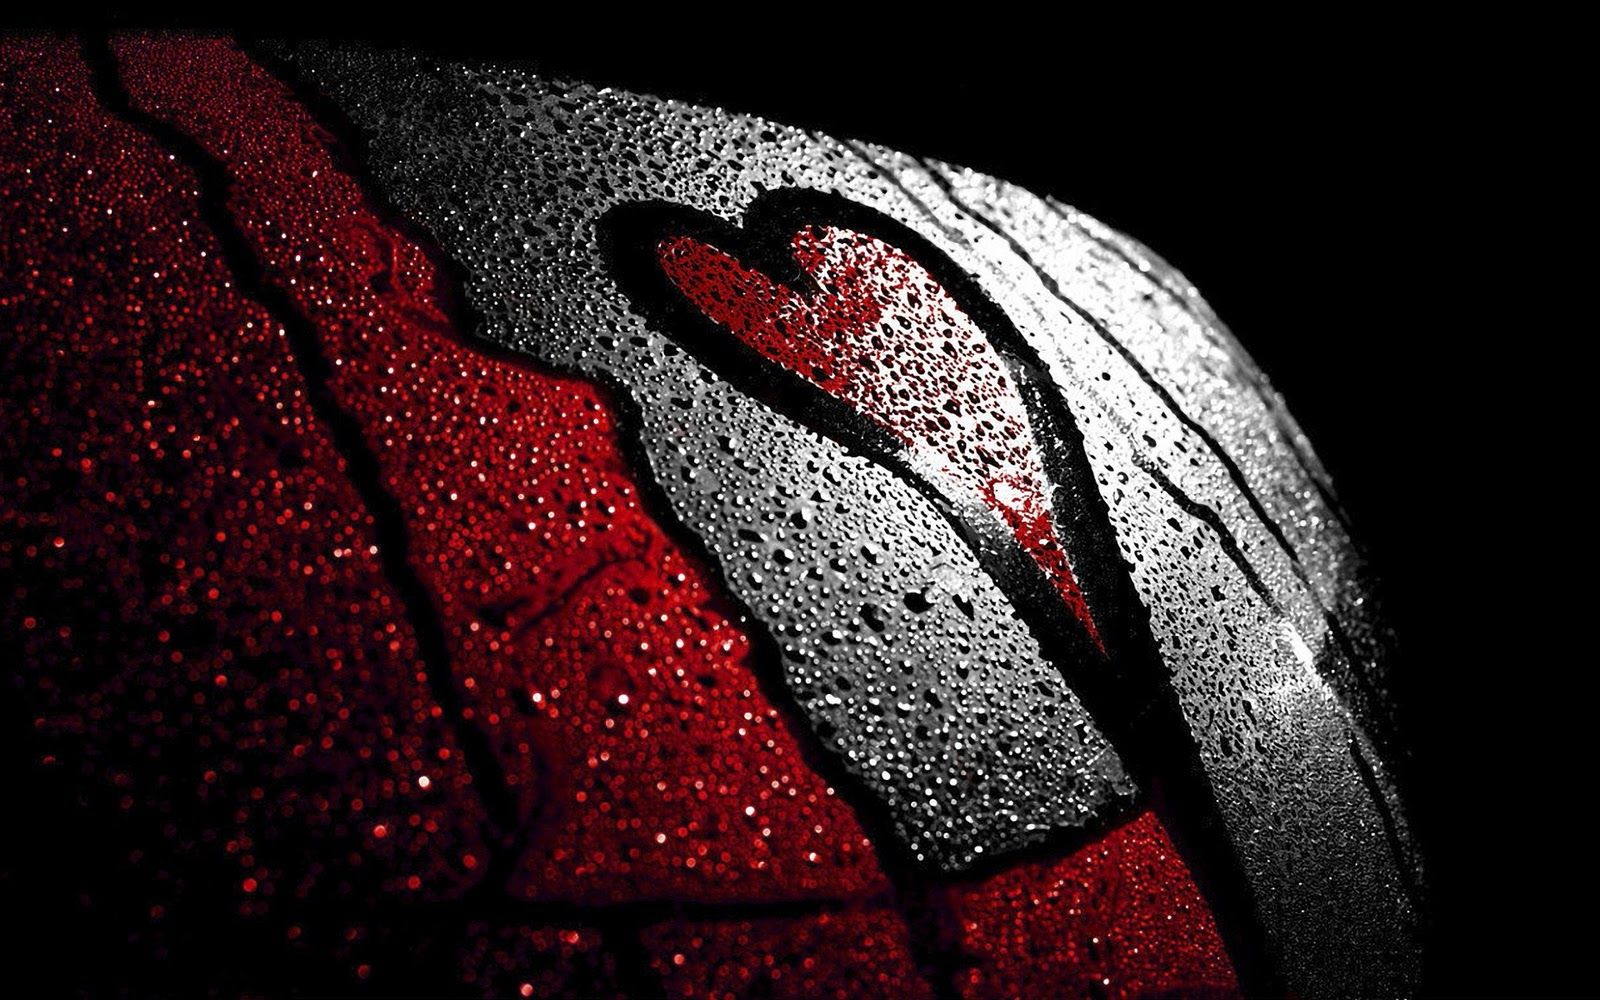 Love Red And Black Wallpaper Love Wallpaper Heart Wallpaper